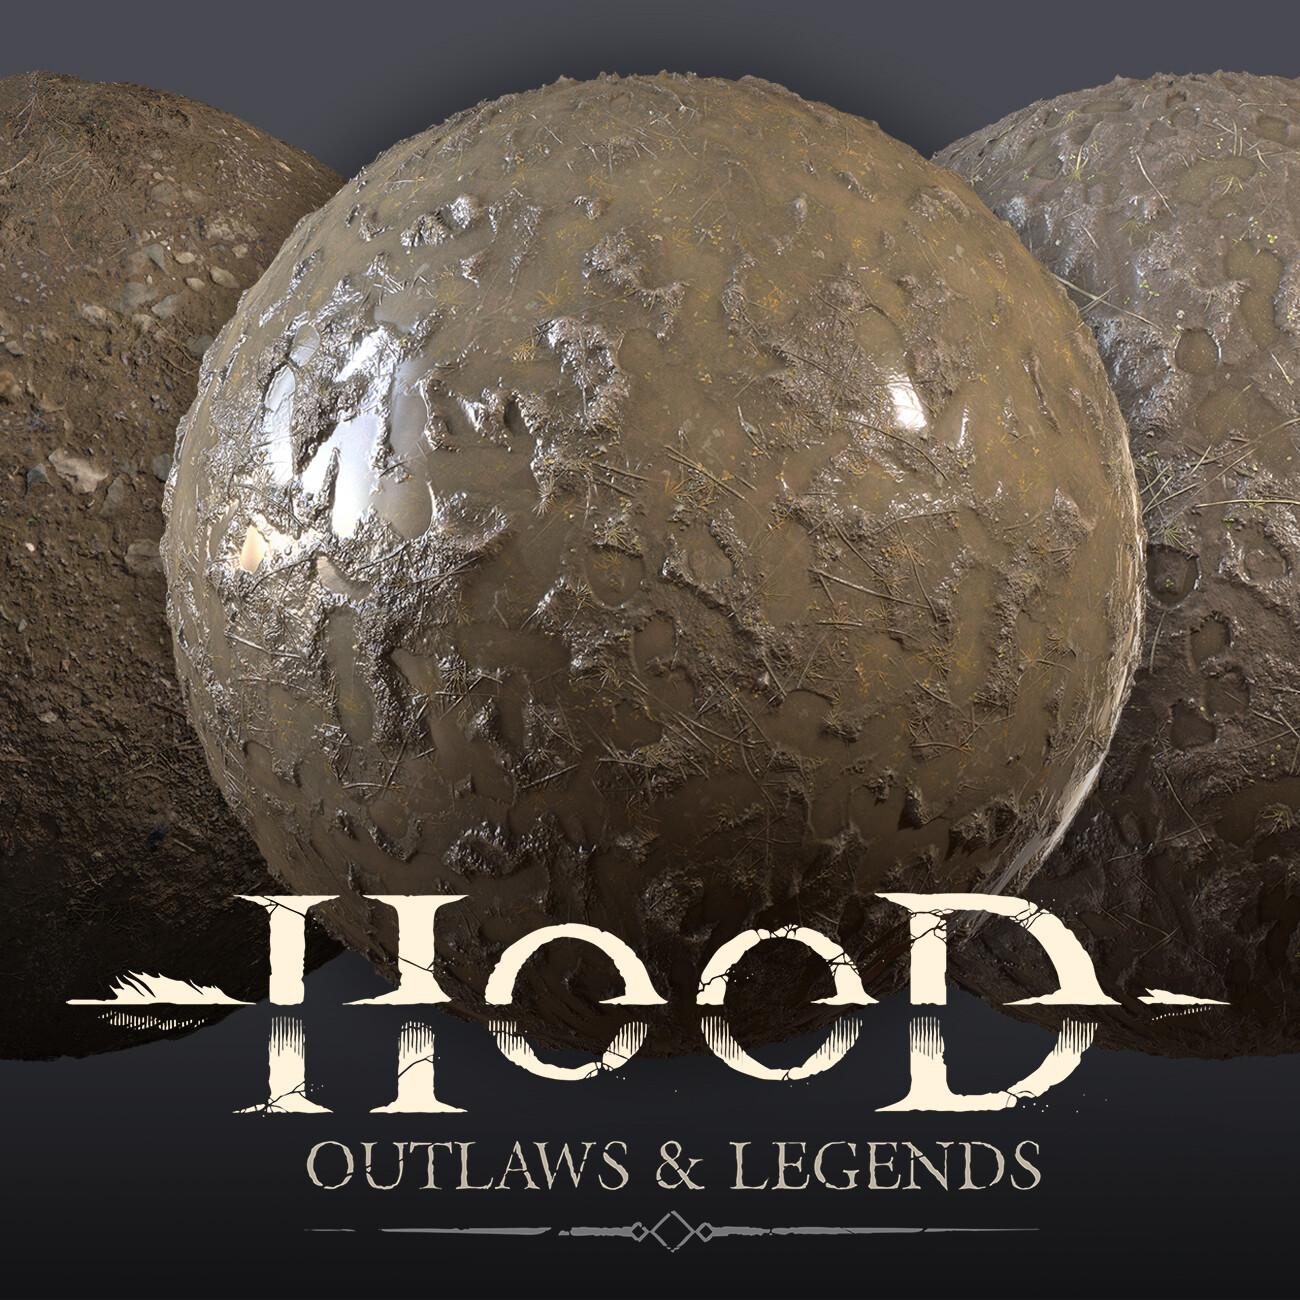 Hood: Outlaws & Legends - Mud Materials